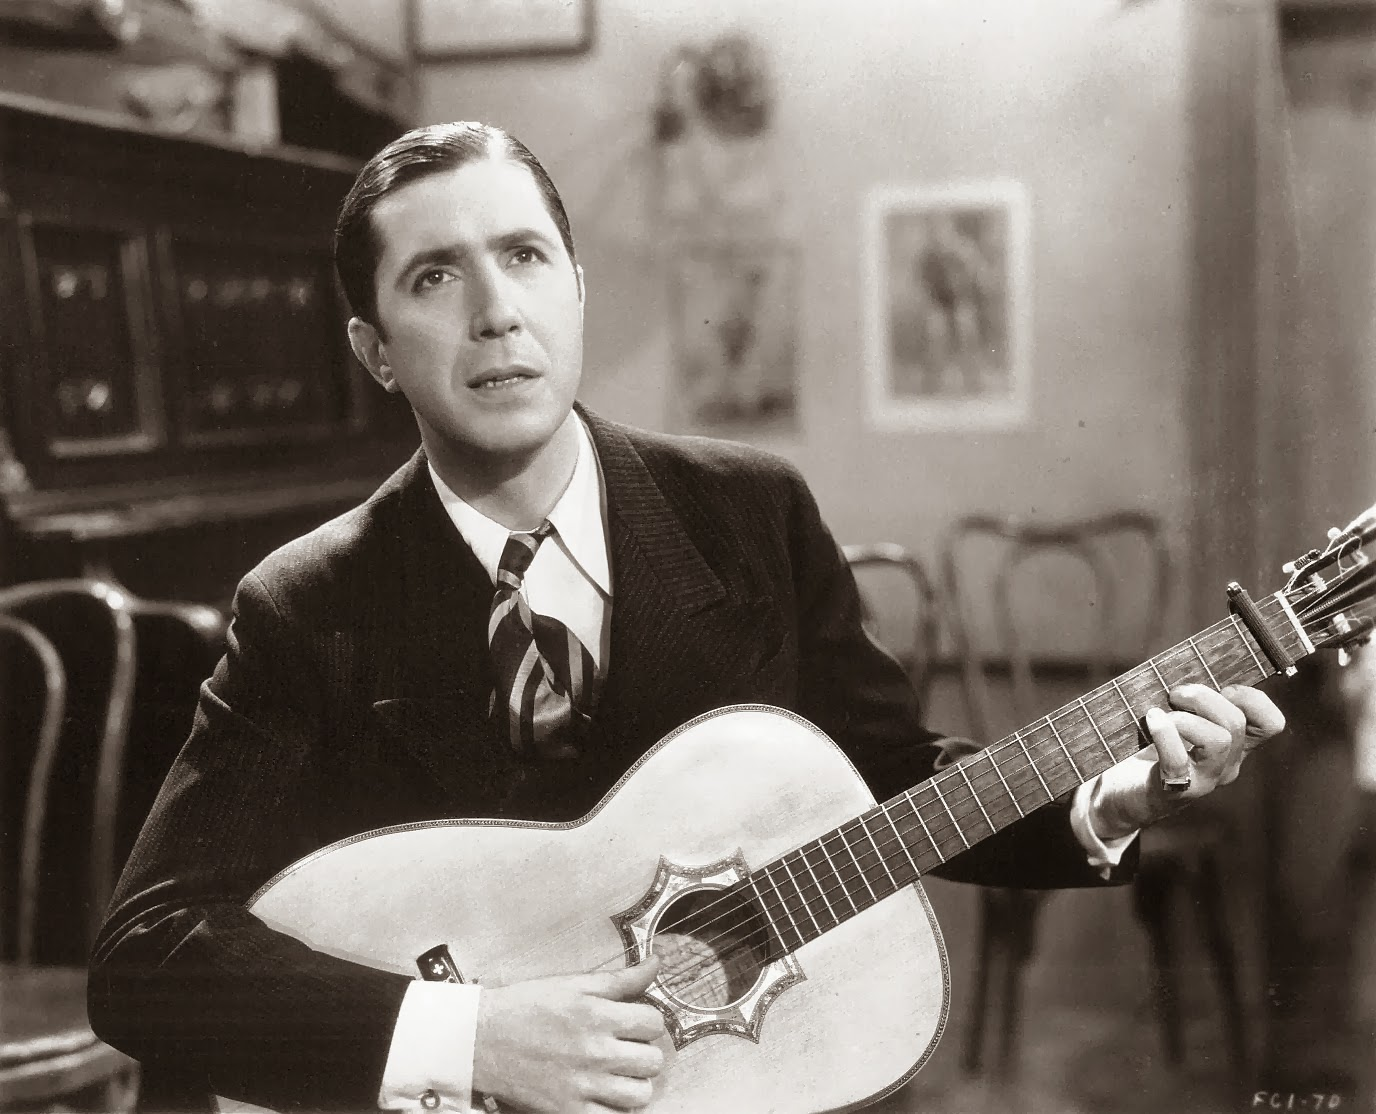 maandag 24 juni 1935 (El día que murió la música)